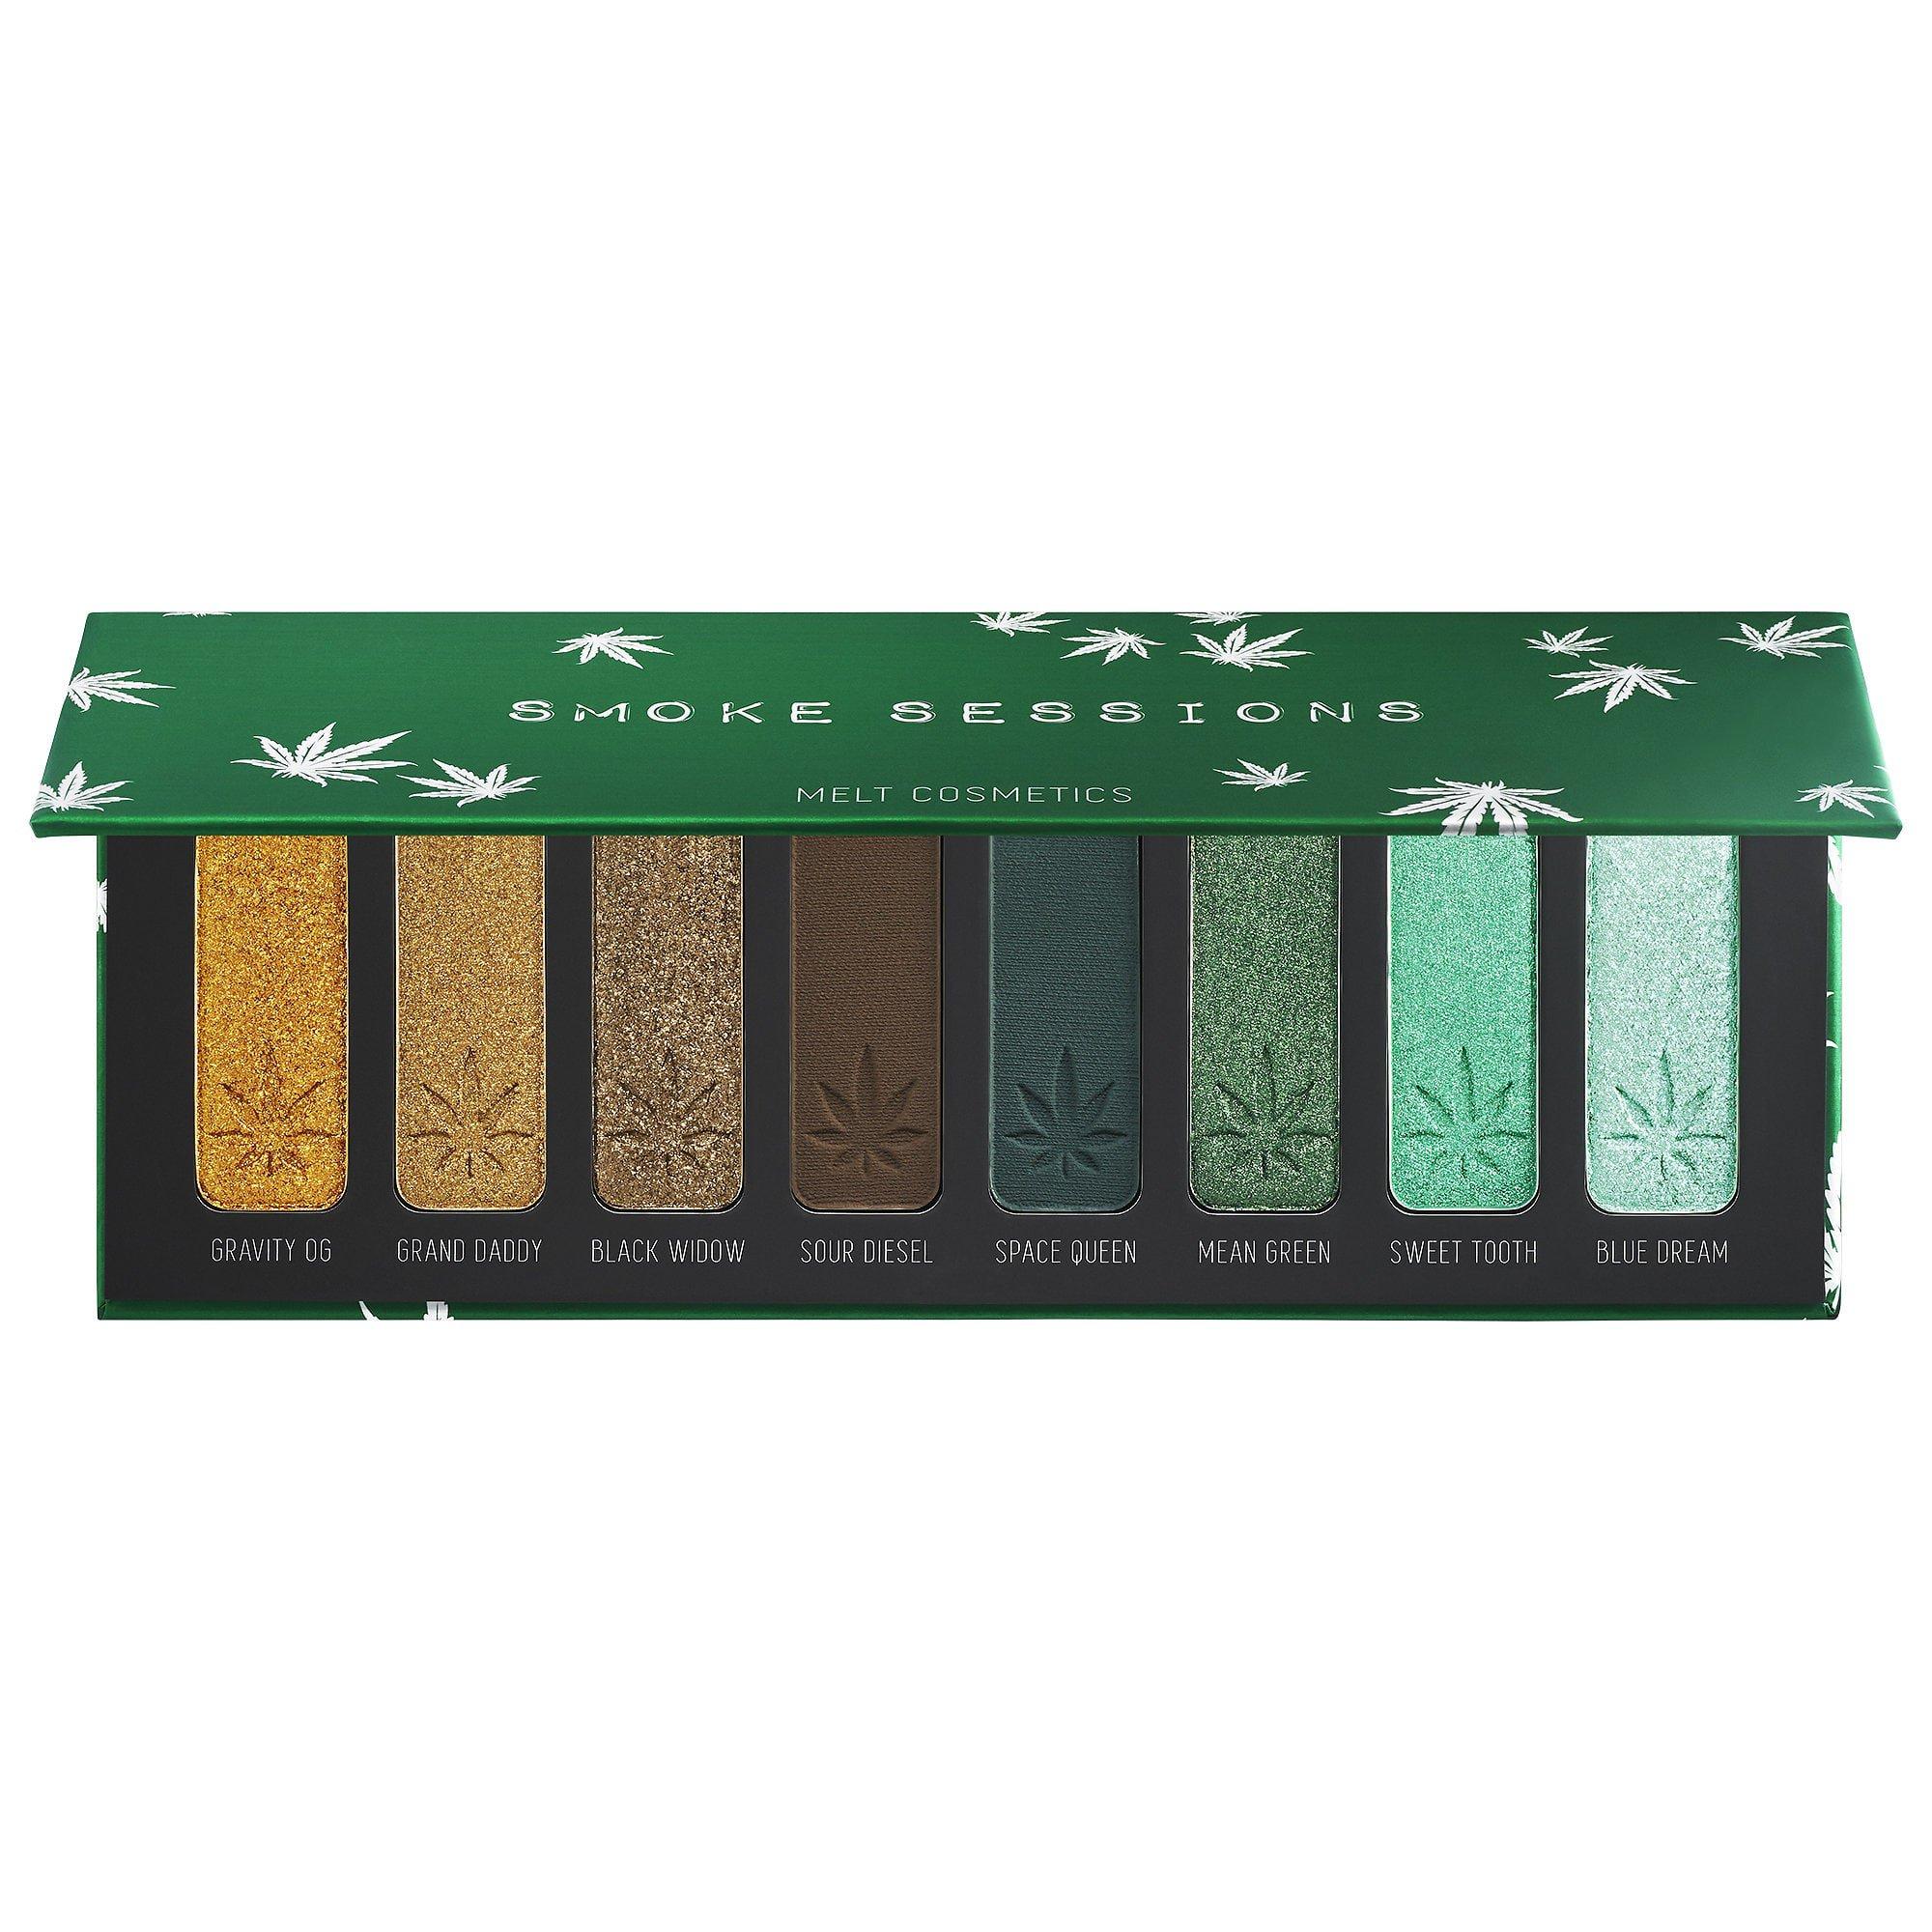 Smoke Sessions Eyeshadow Palette - Melt Cosmetics | Sephora